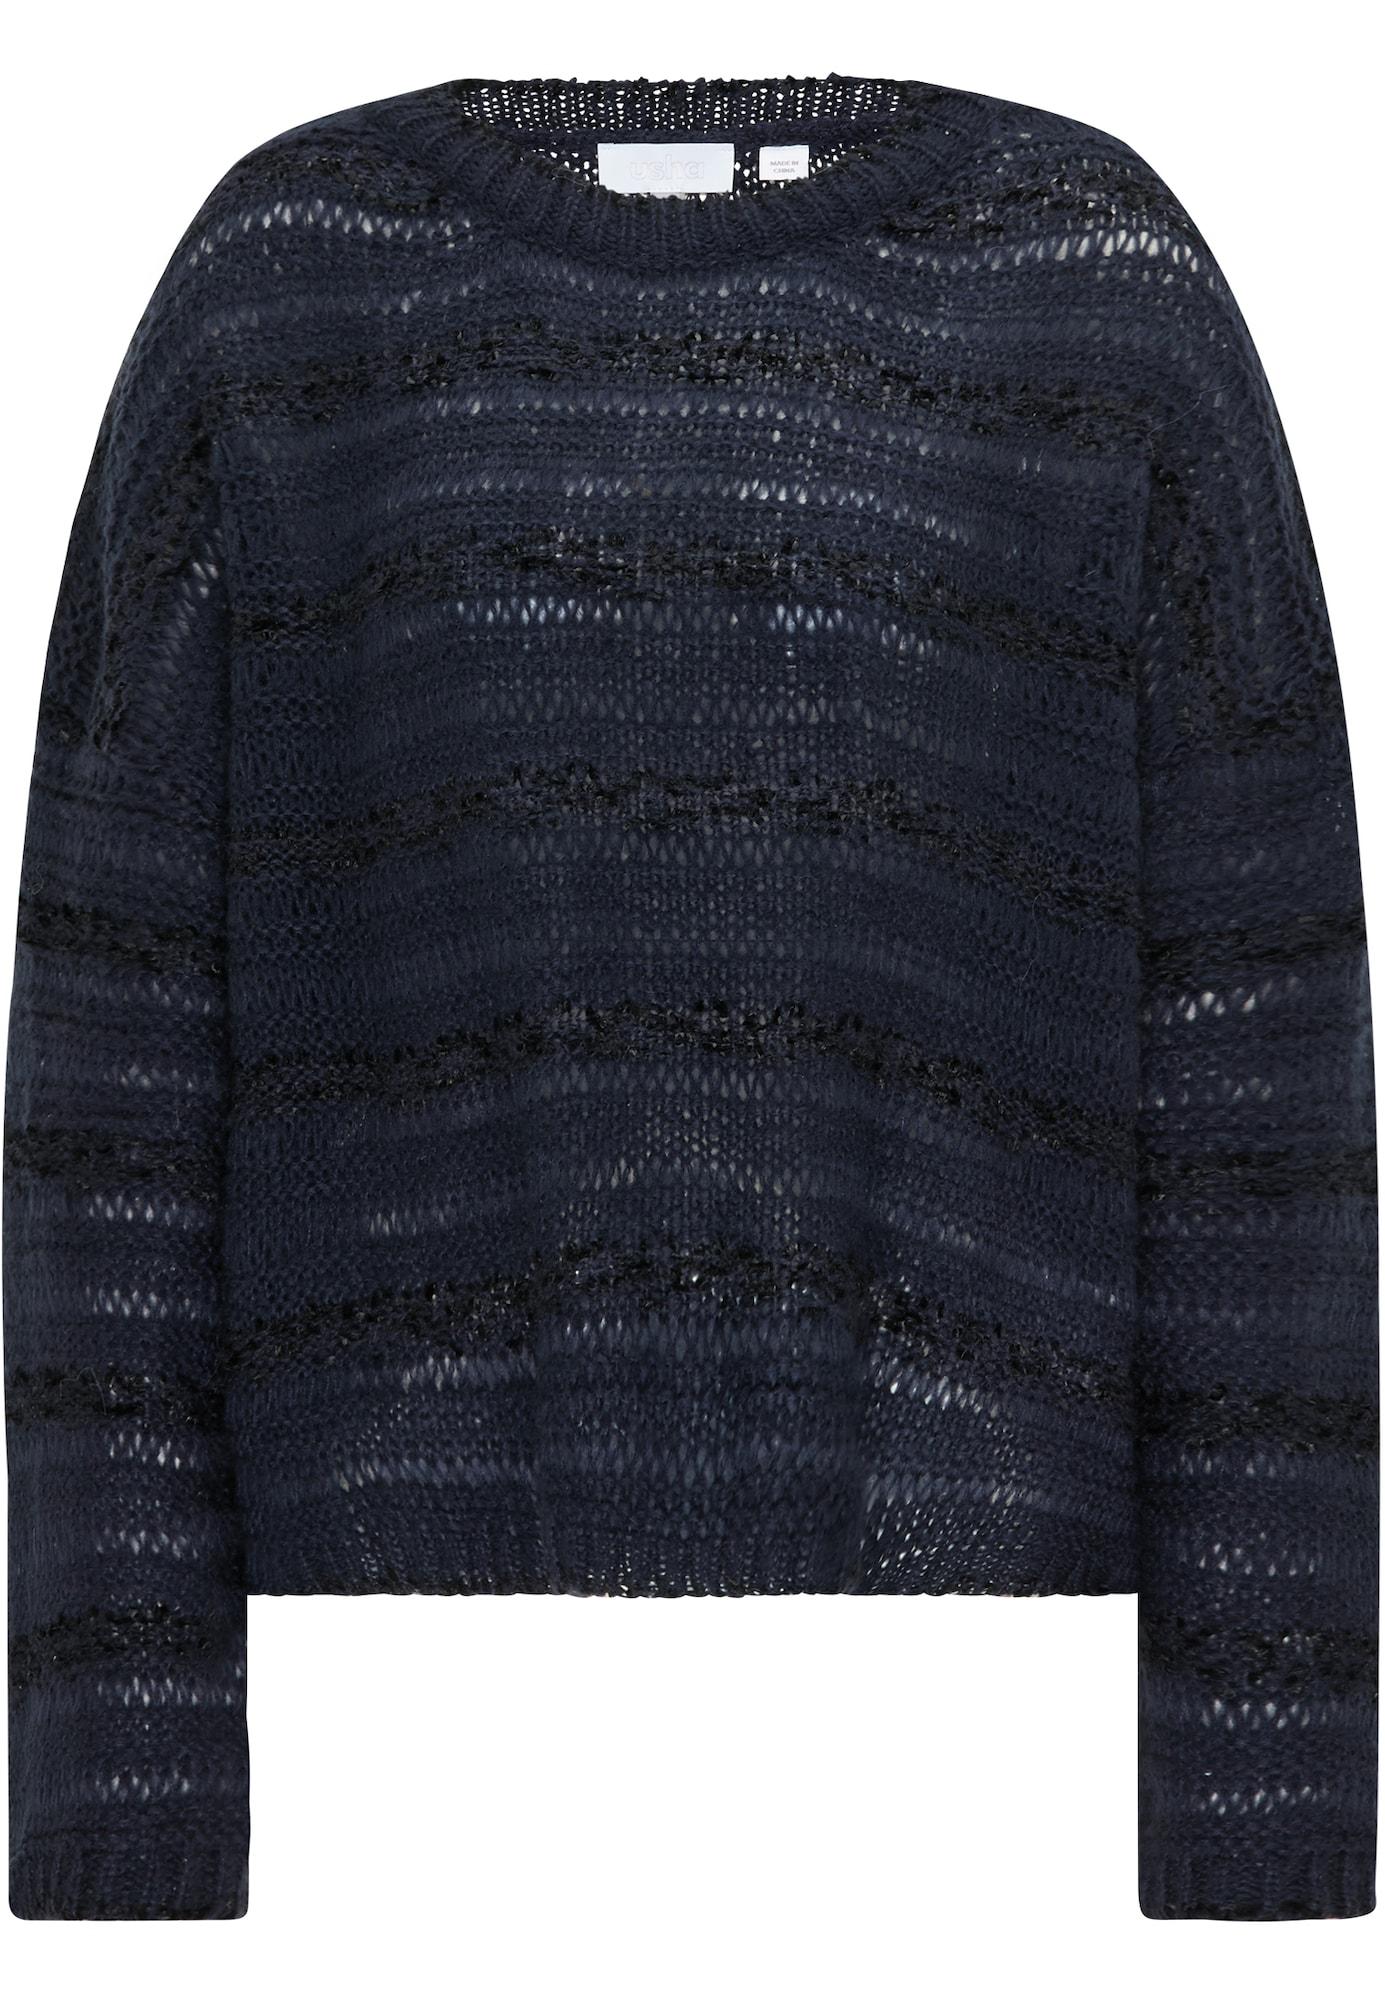 usha WHITE LABEL Megztinis mėlyna / nakties mėlyna